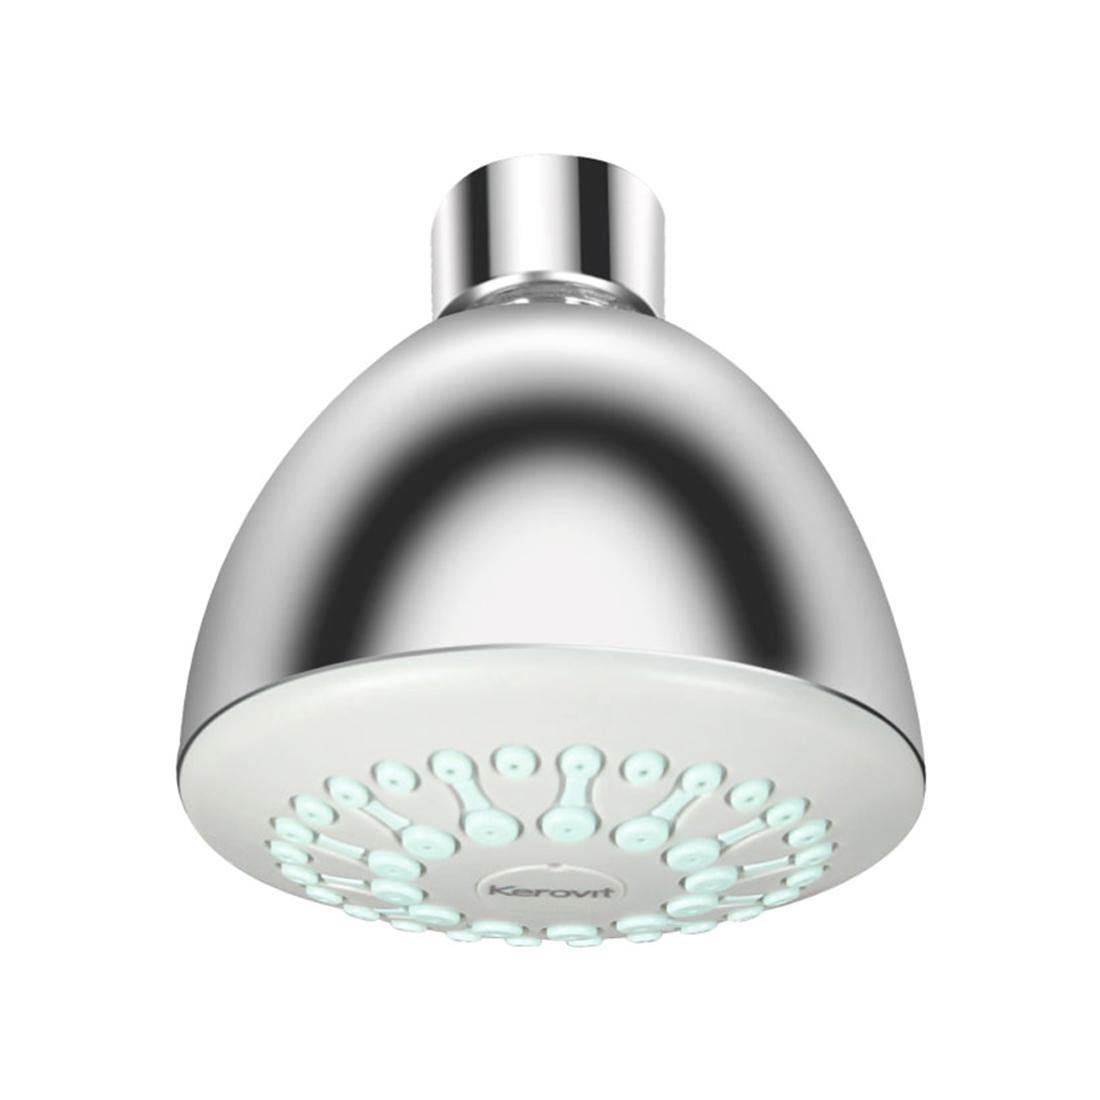 Kerovit KA550002 Single Function Overhead Shower